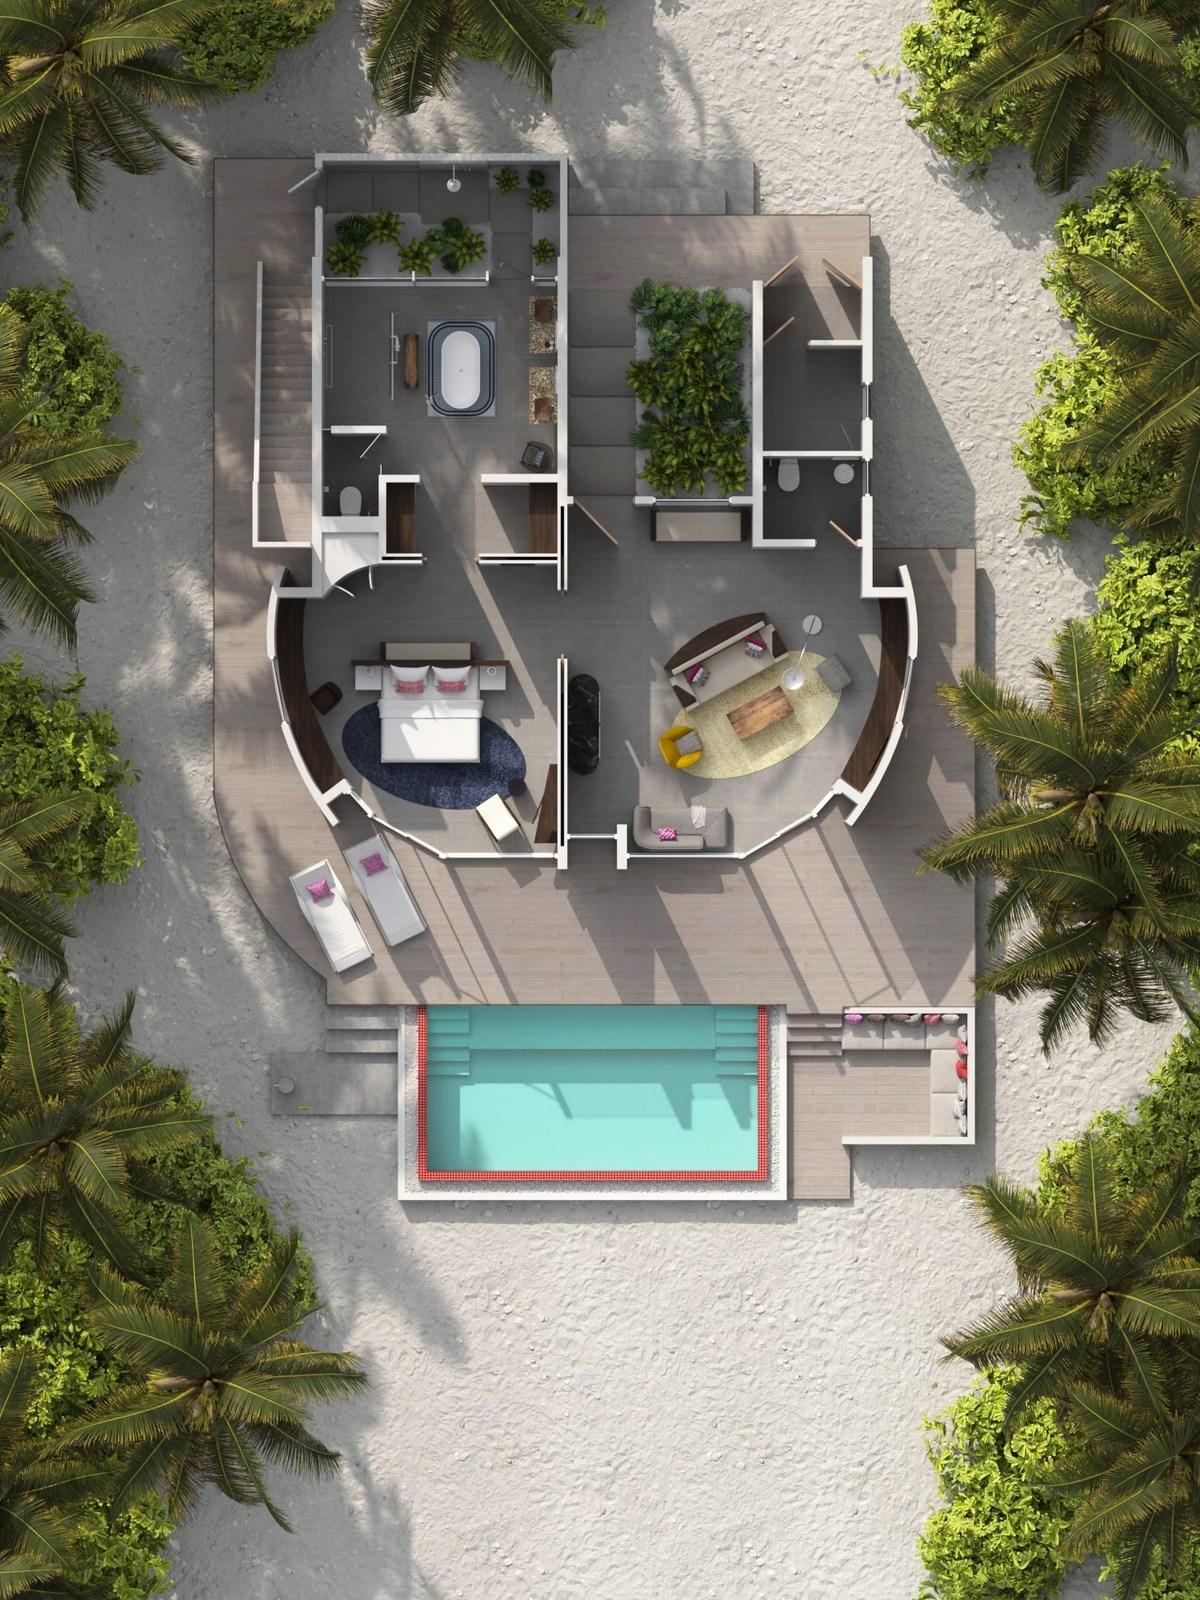 Мальдивы, отель LUX North Male Atoll, план-схема номера Beach Villa with Pool